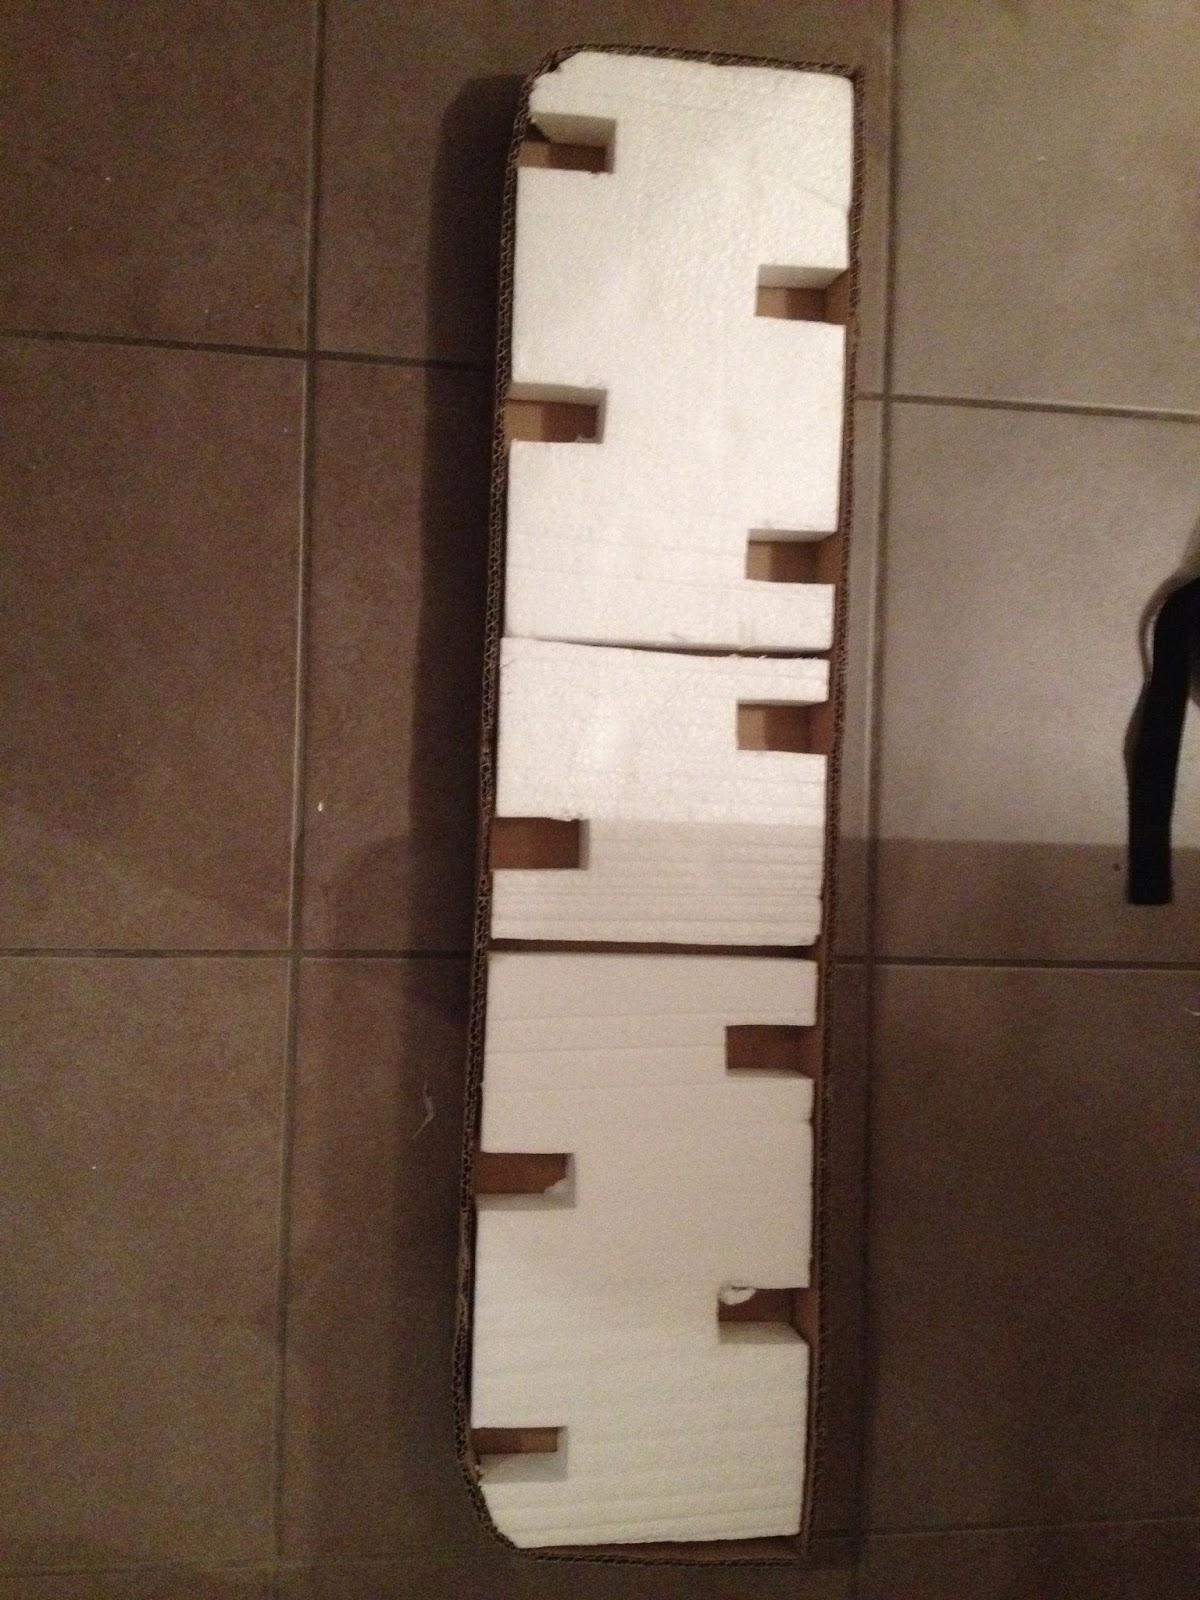 les diy de fishounette chemin e de no l. Black Bedroom Furniture Sets. Home Design Ideas